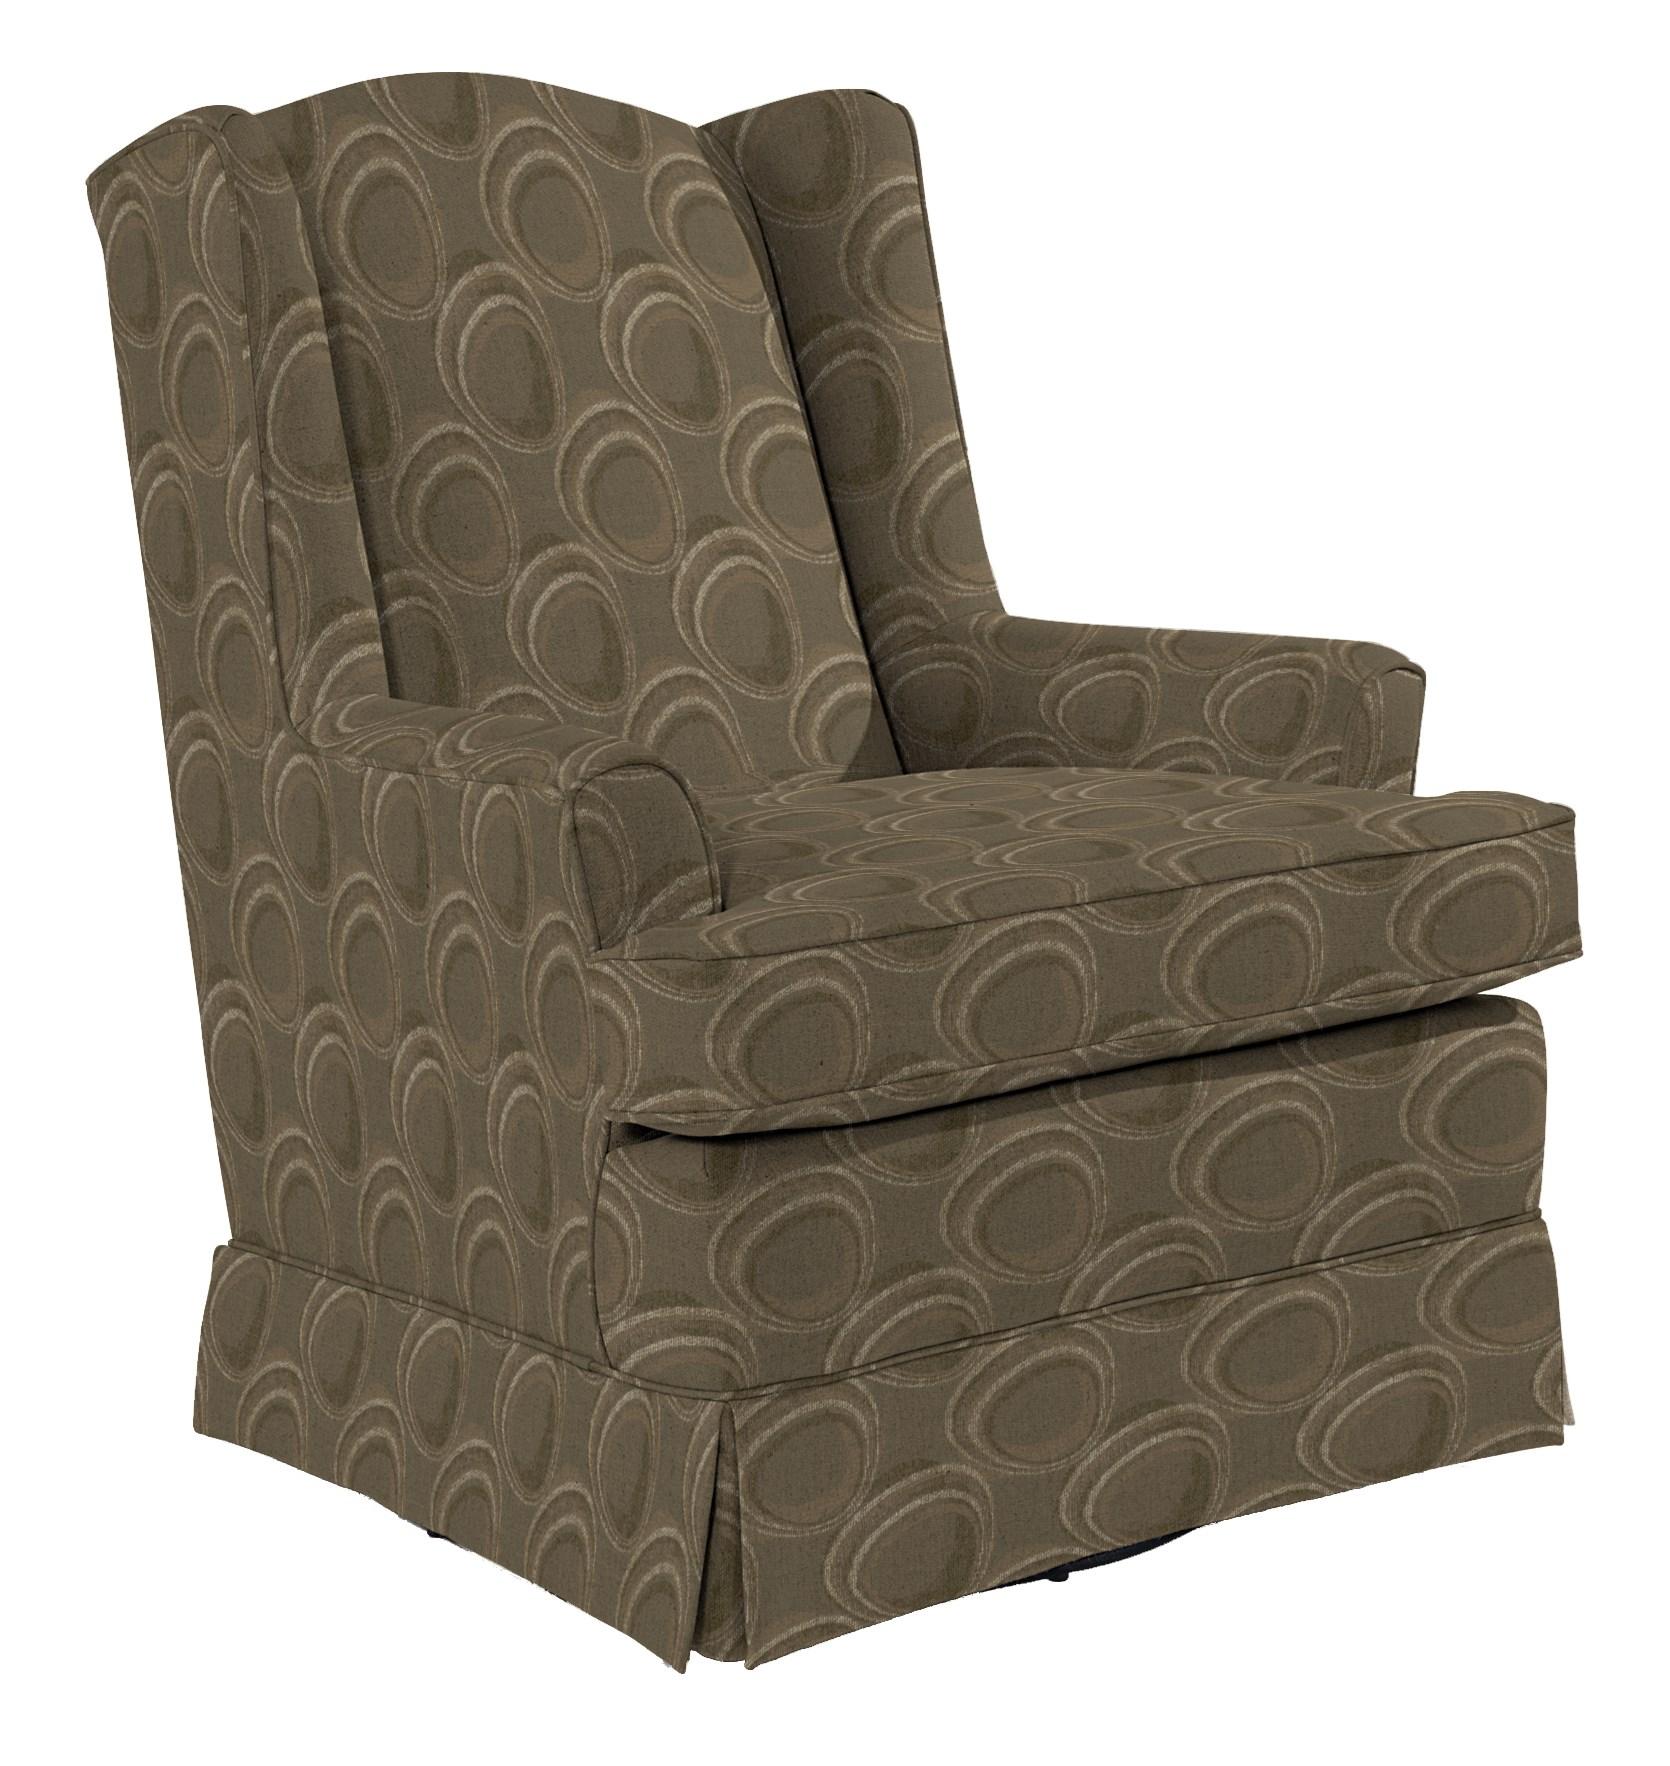 Best Home Furnishings Chairs - Swivel Glide Natasha Swivel Glider - Item Number: 7147-28733